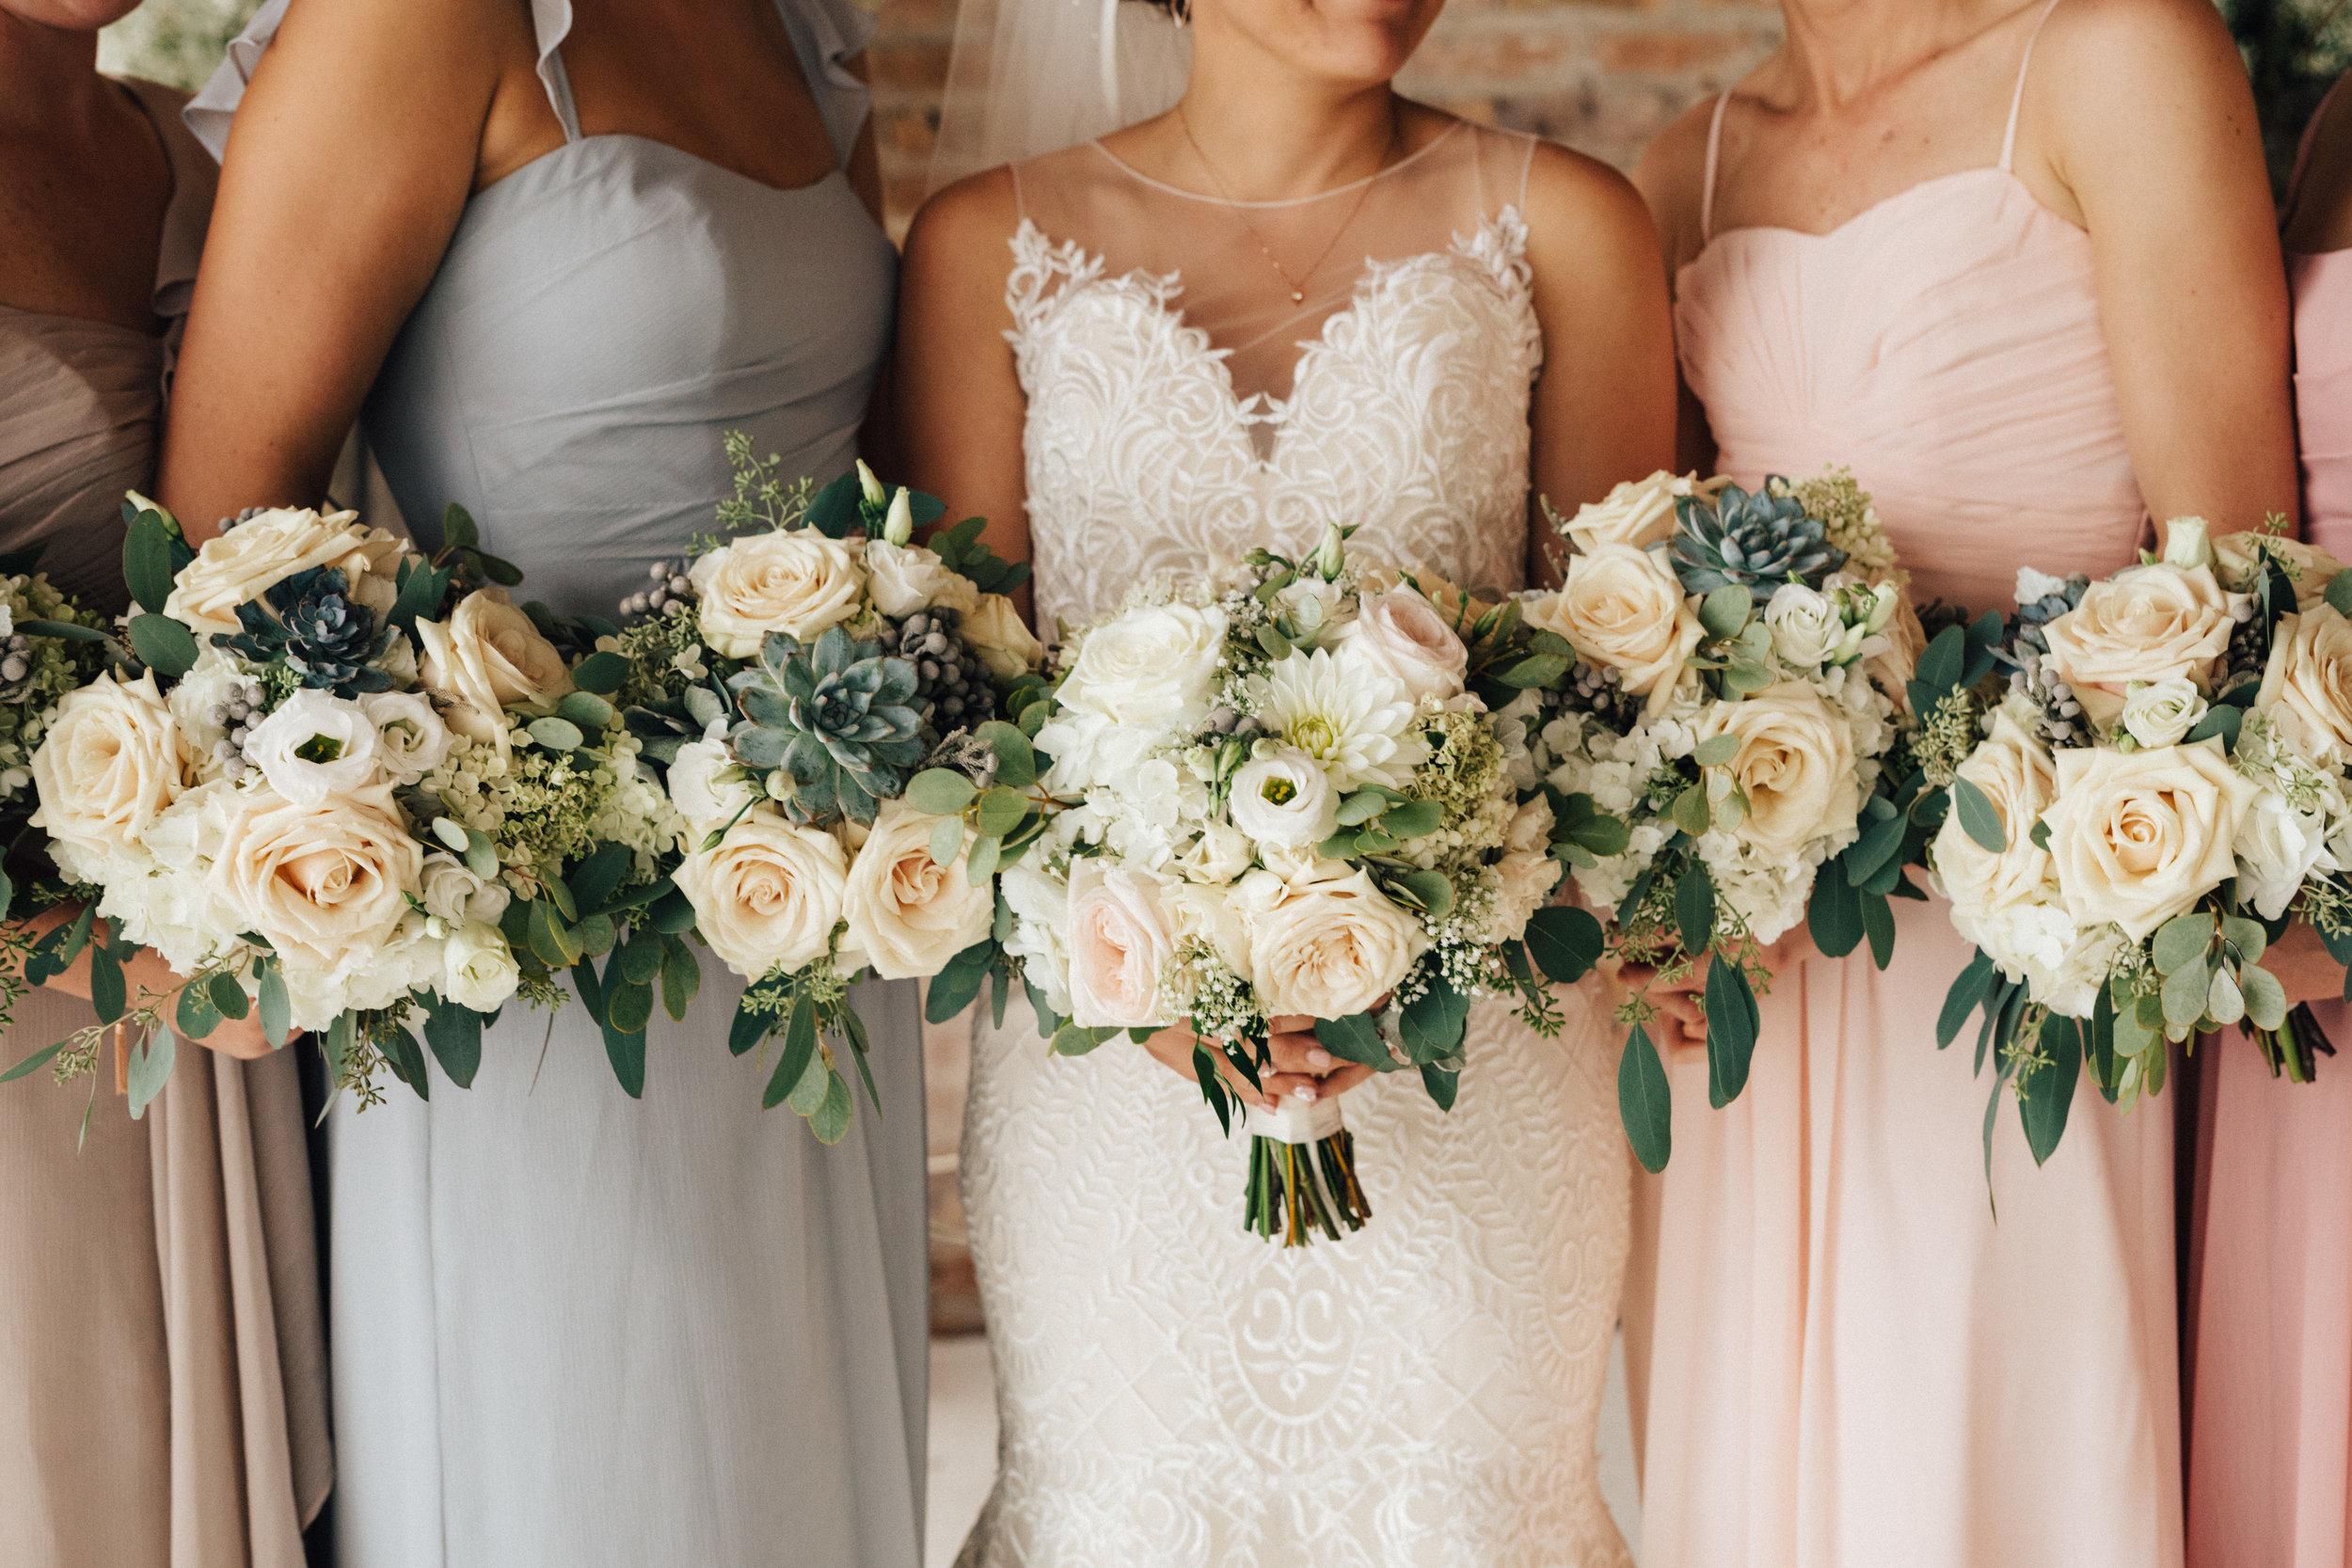 Vintage Wedding_Polly C Photography_20171726175624.jpg